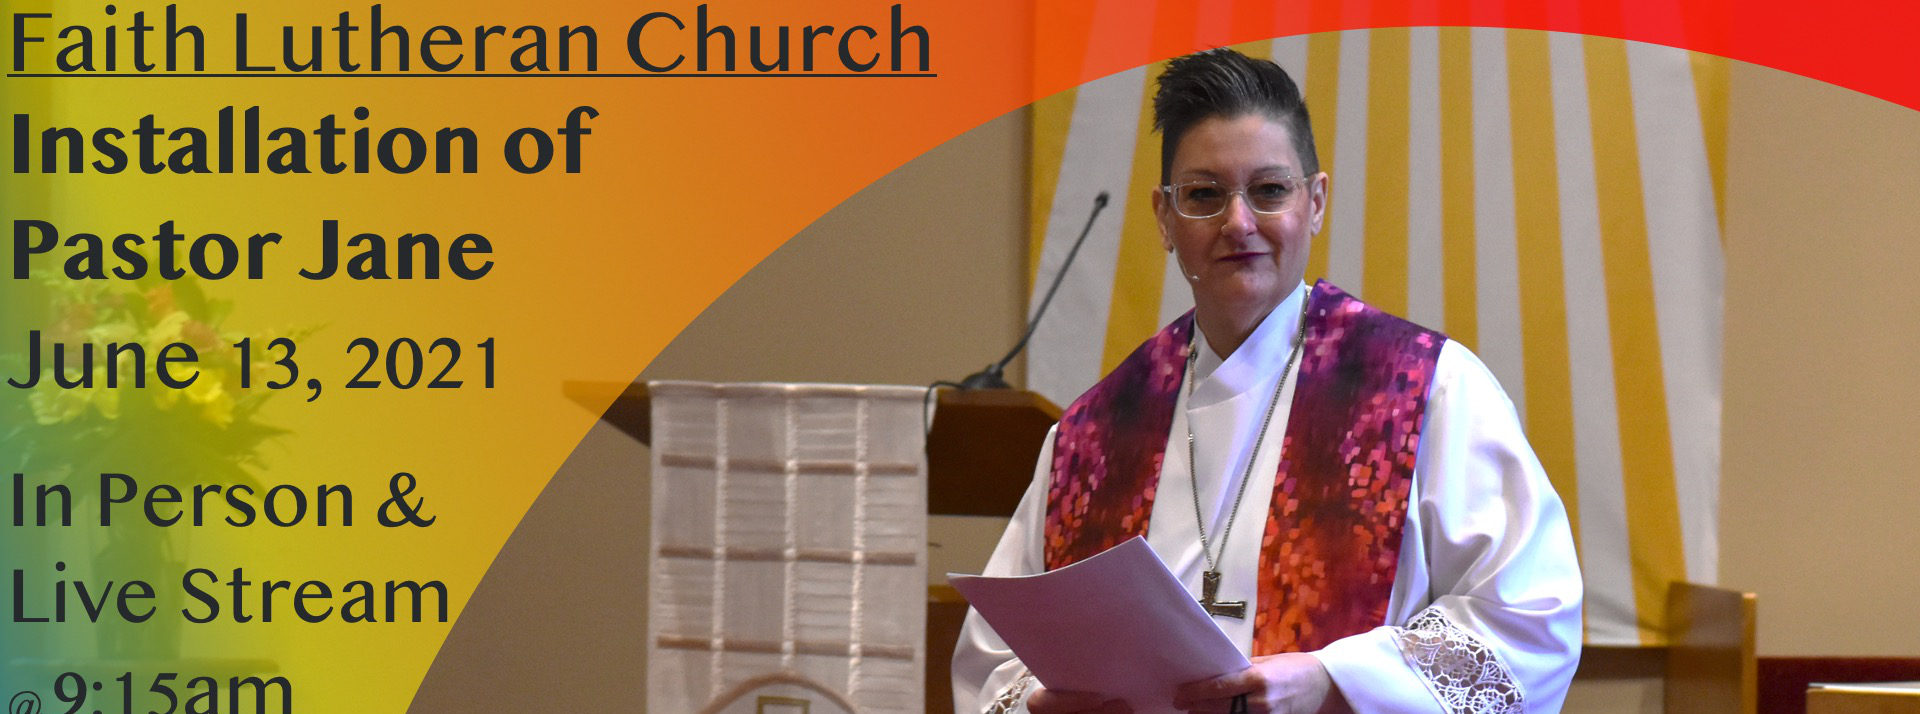 Pastor Jane's Installation Service